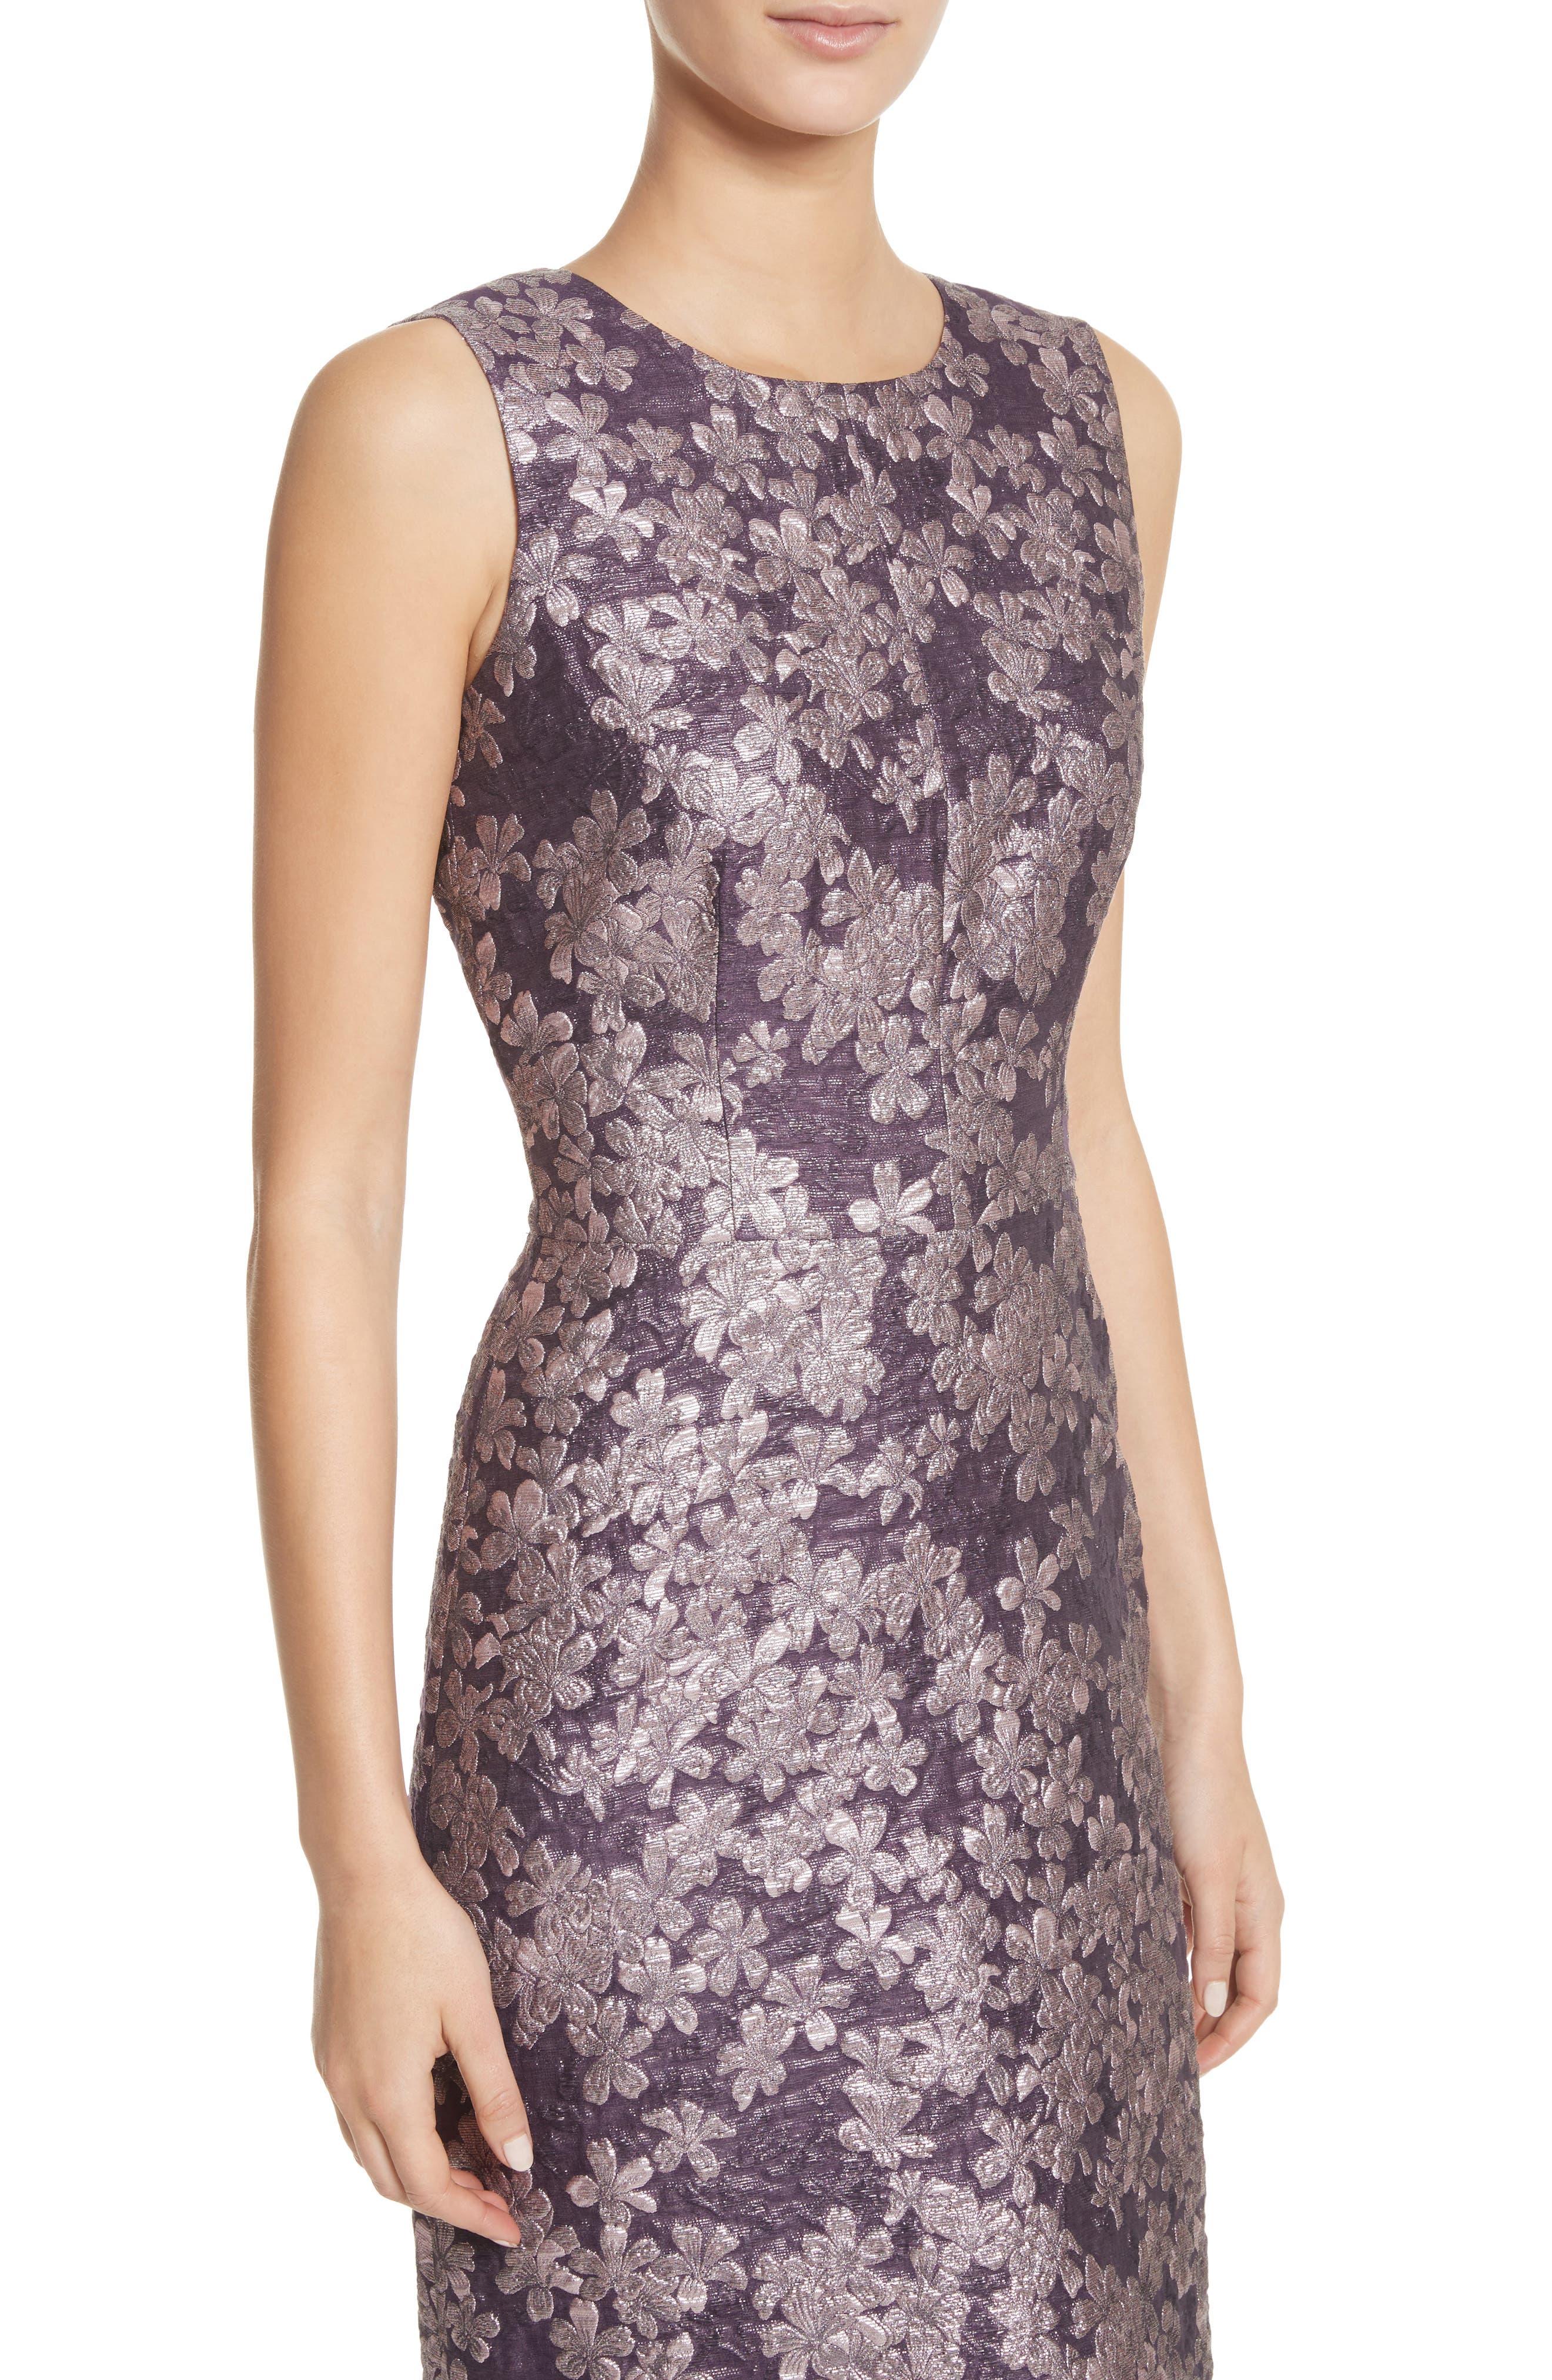 Metallic Floral Jacquard Dress,                             Alternate thumbnail 4, color,                             560